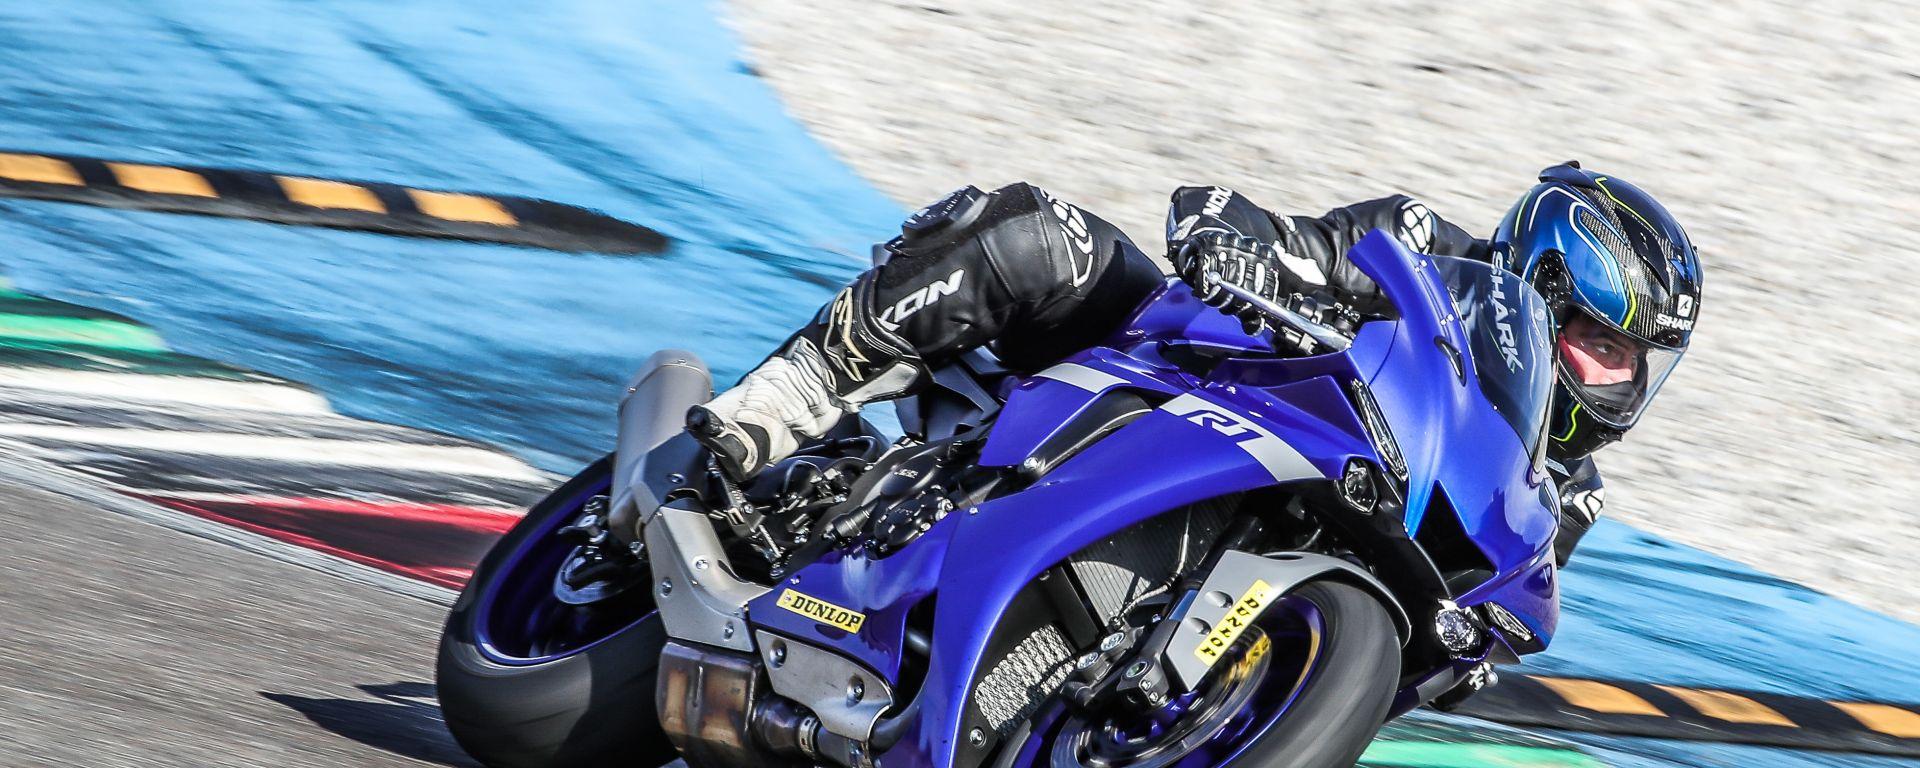 Yamaha R1 e R1M 2020: perfetta per amatori e Pro